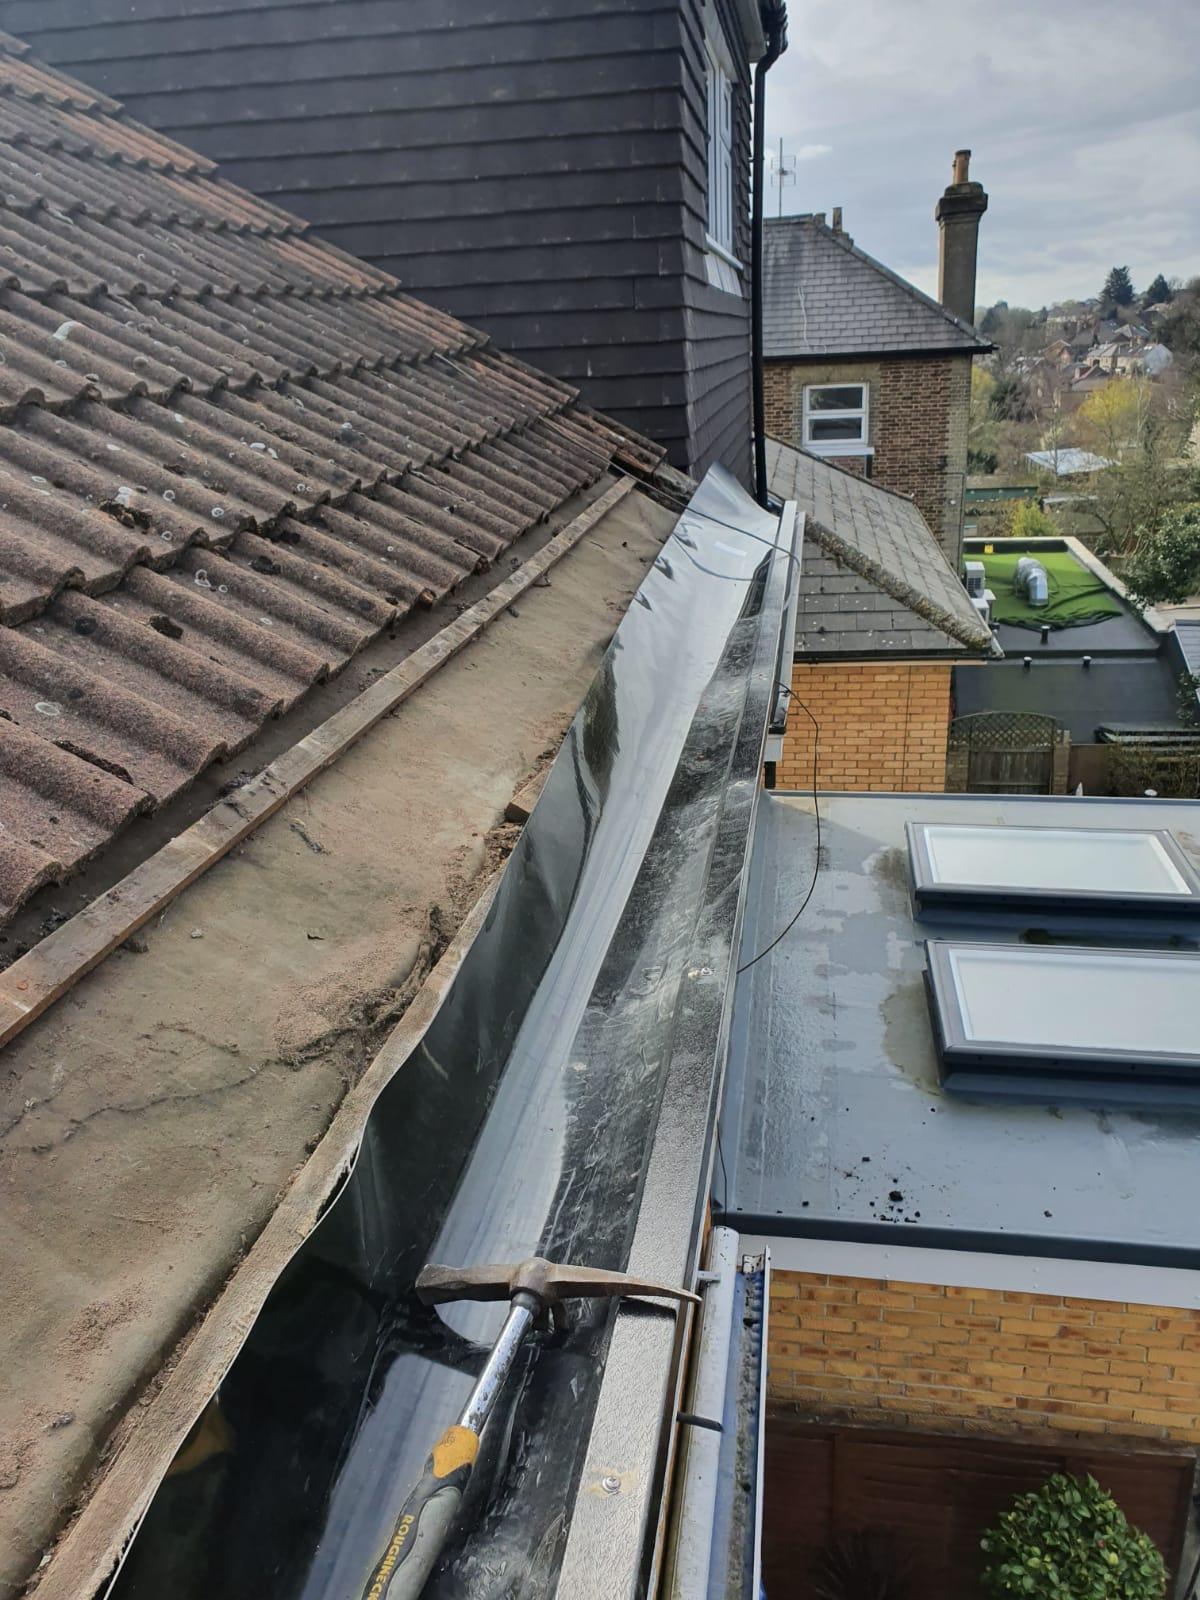 Residential gutter lining